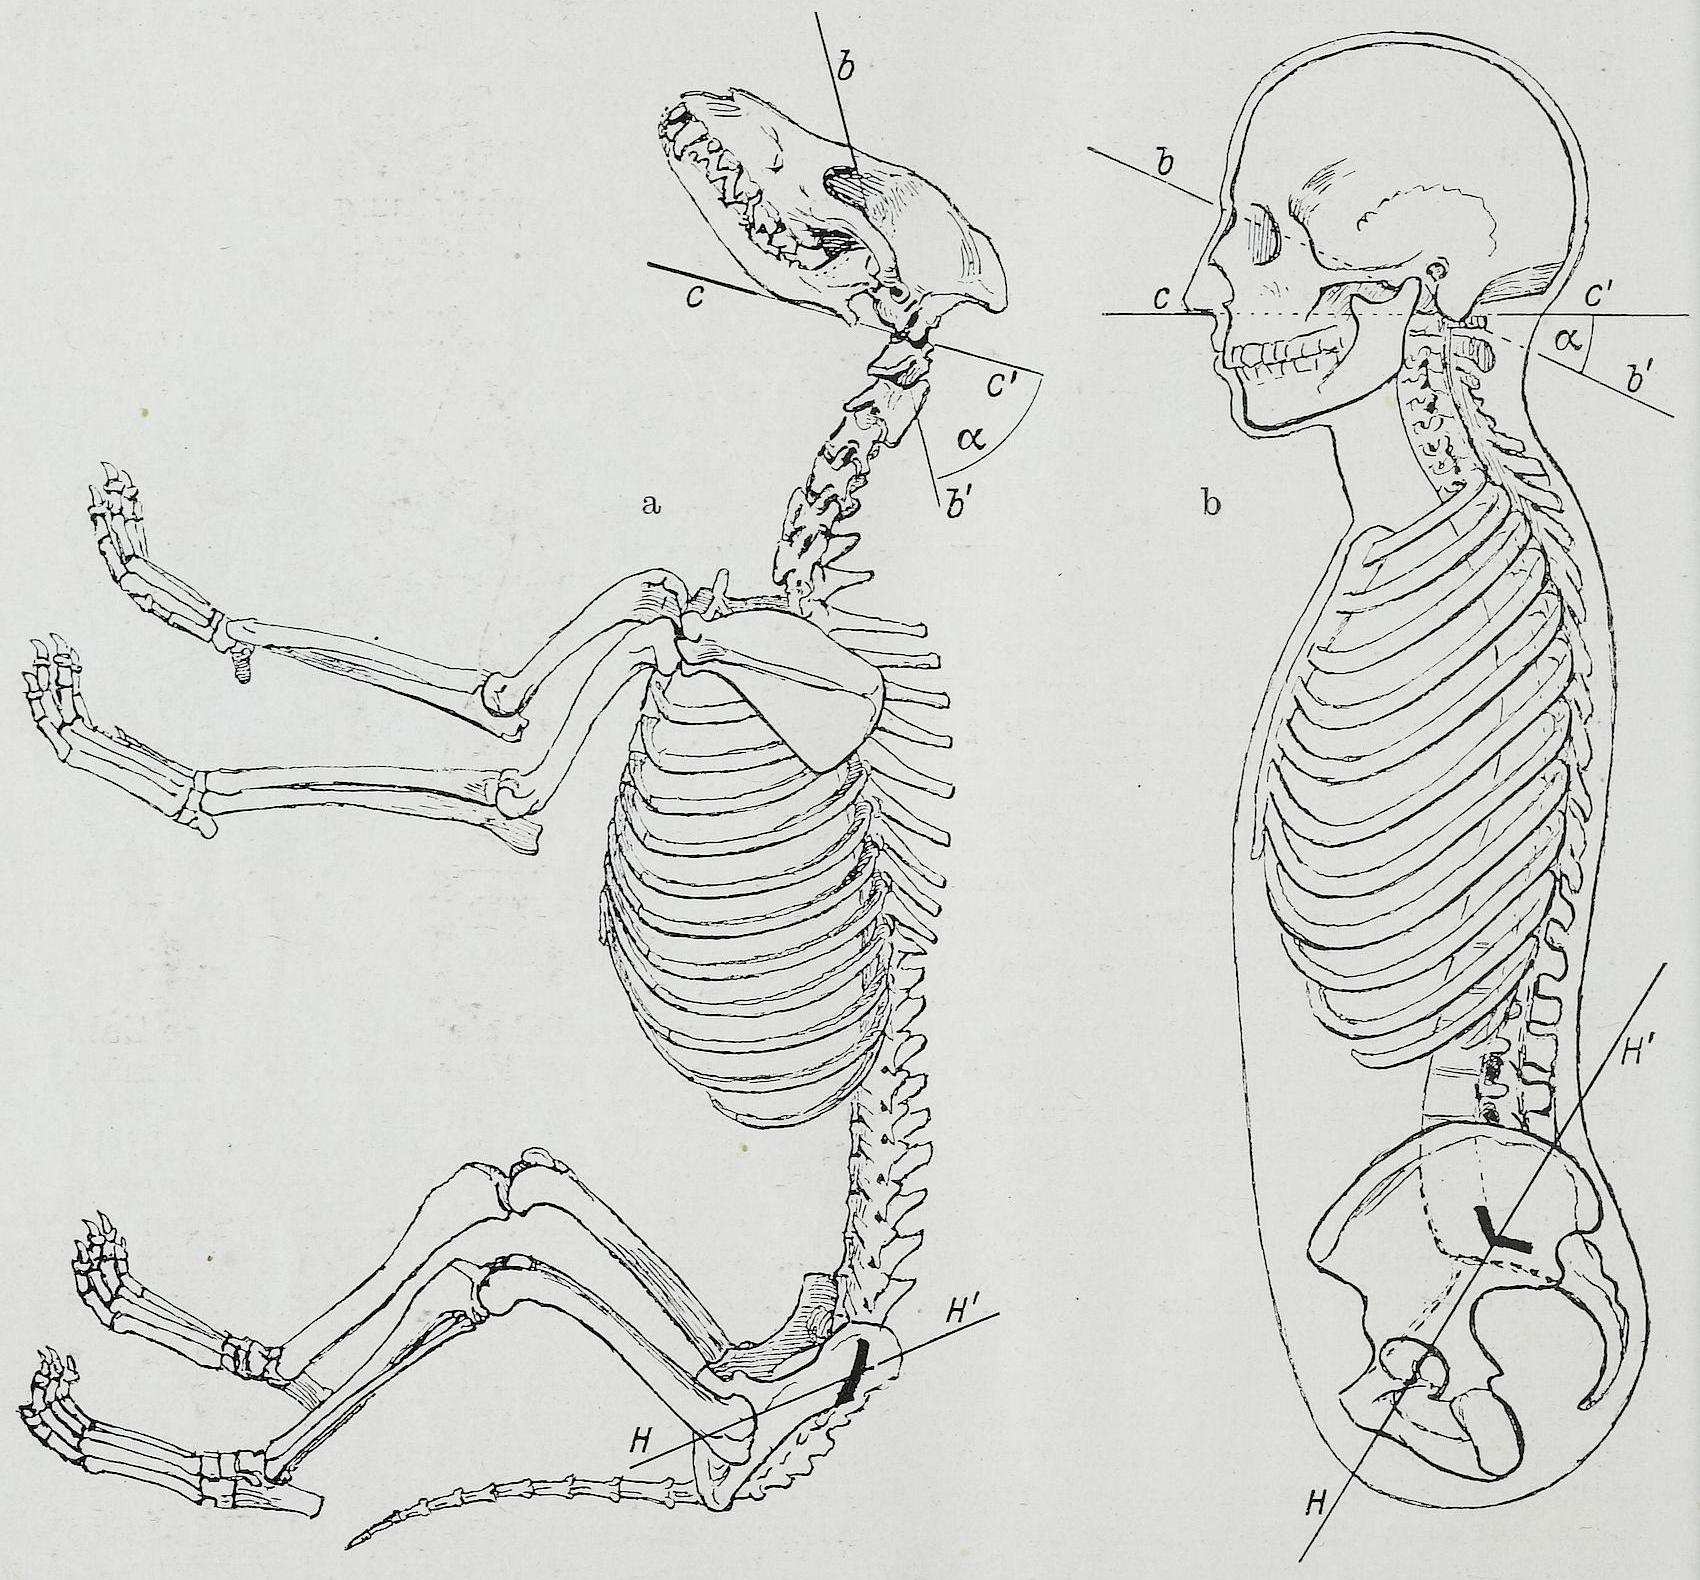 worksheet Comparative Anatomy Worksheet comparative anatomy filebraus 1921 80 png source